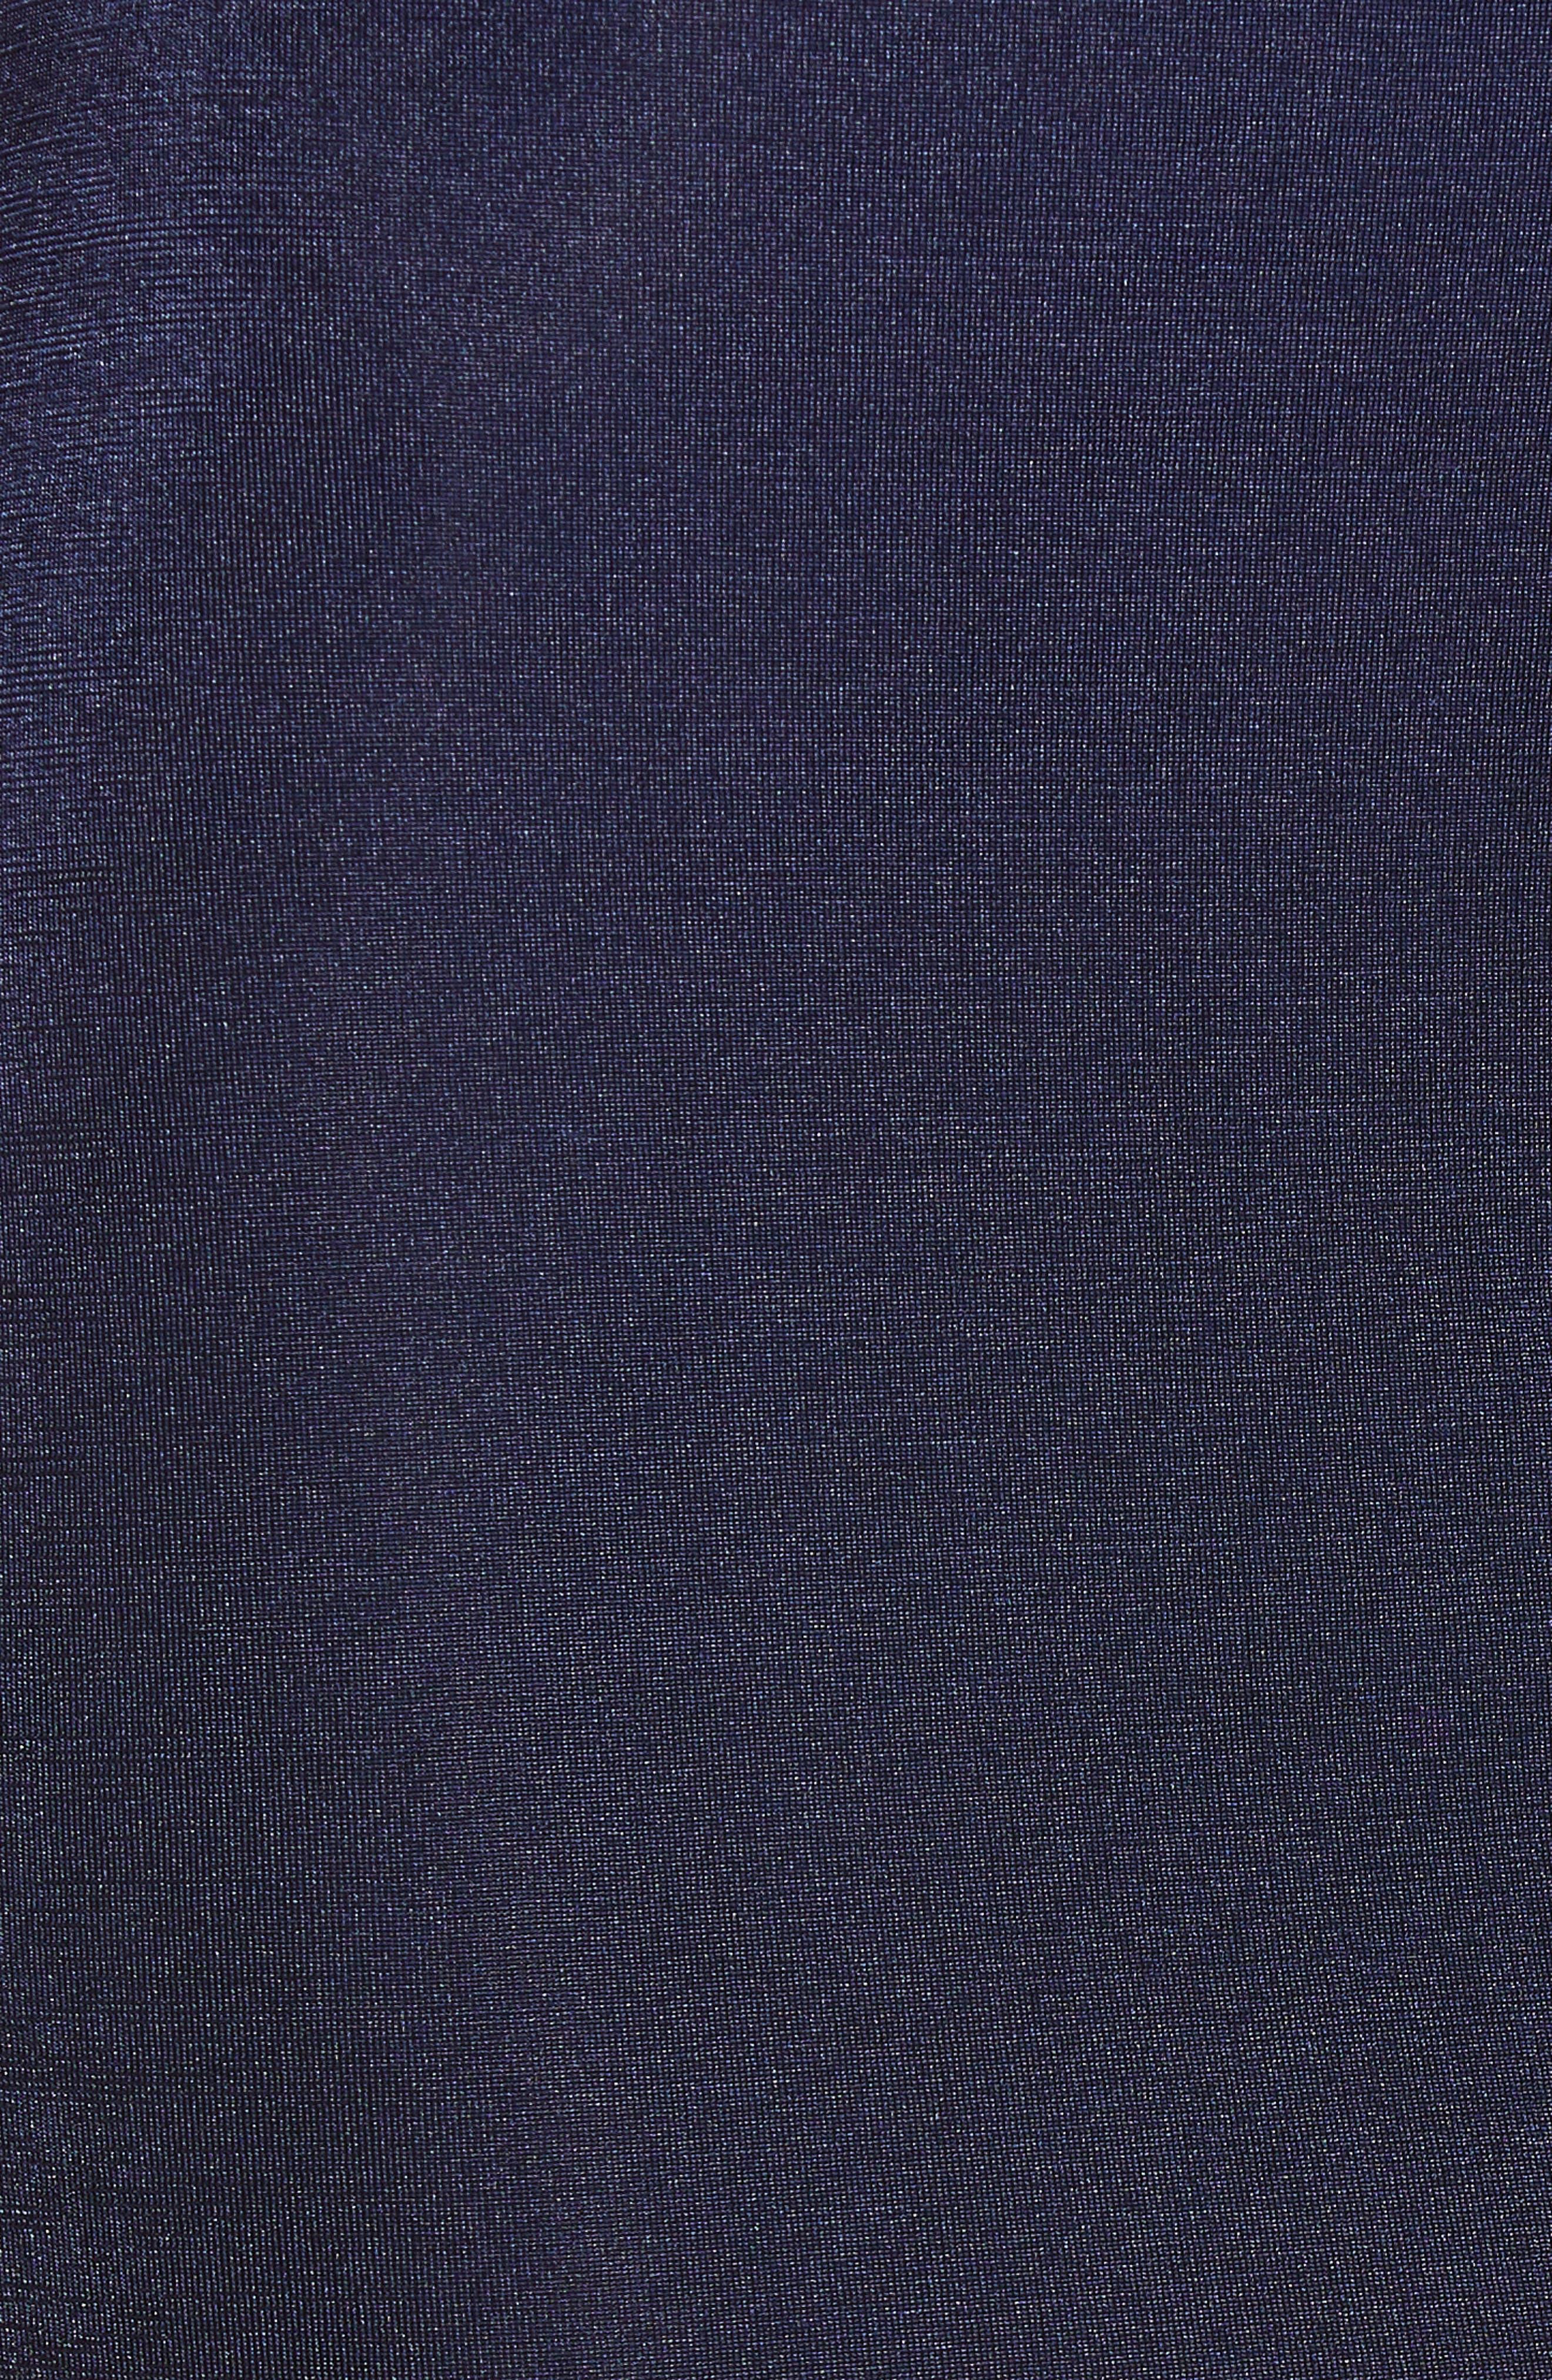 Cowl Neck Minidress,                             Alternate thumbnail 3, color,                             Navy